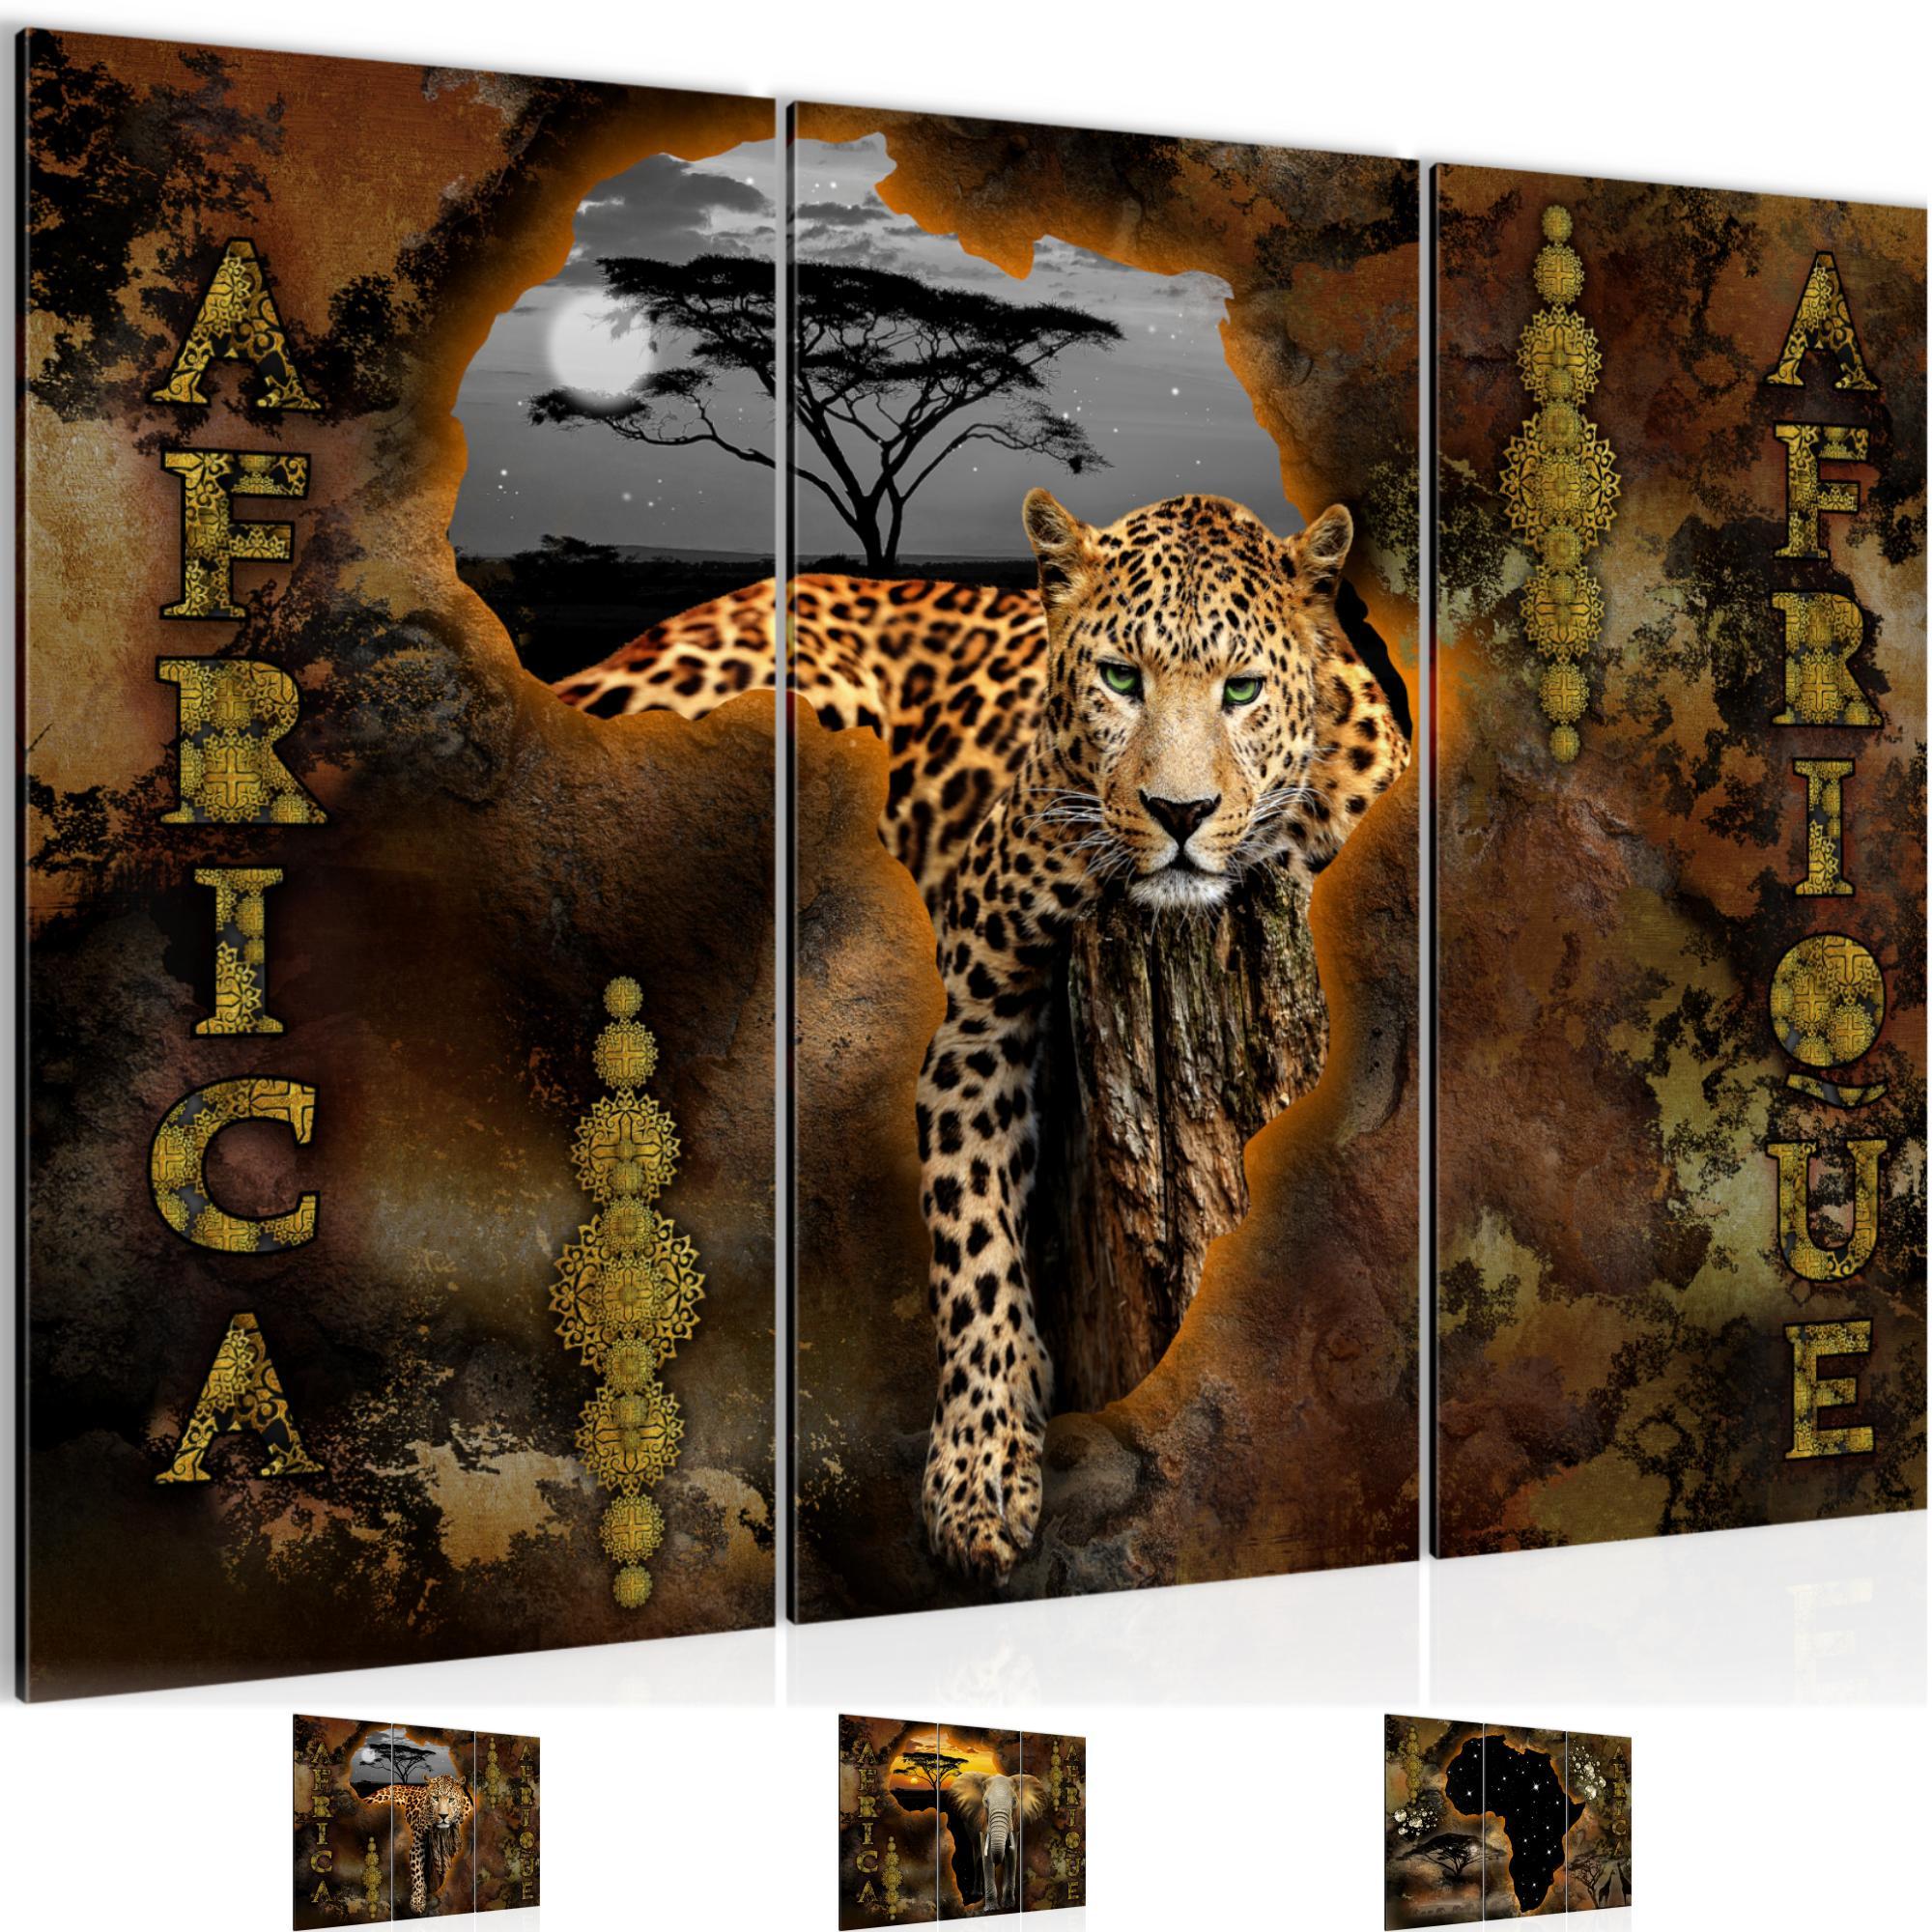 Afrika bild kunstdruck auf vlies leinwand xxl dekoration 022631p - Dekoration afrika ...